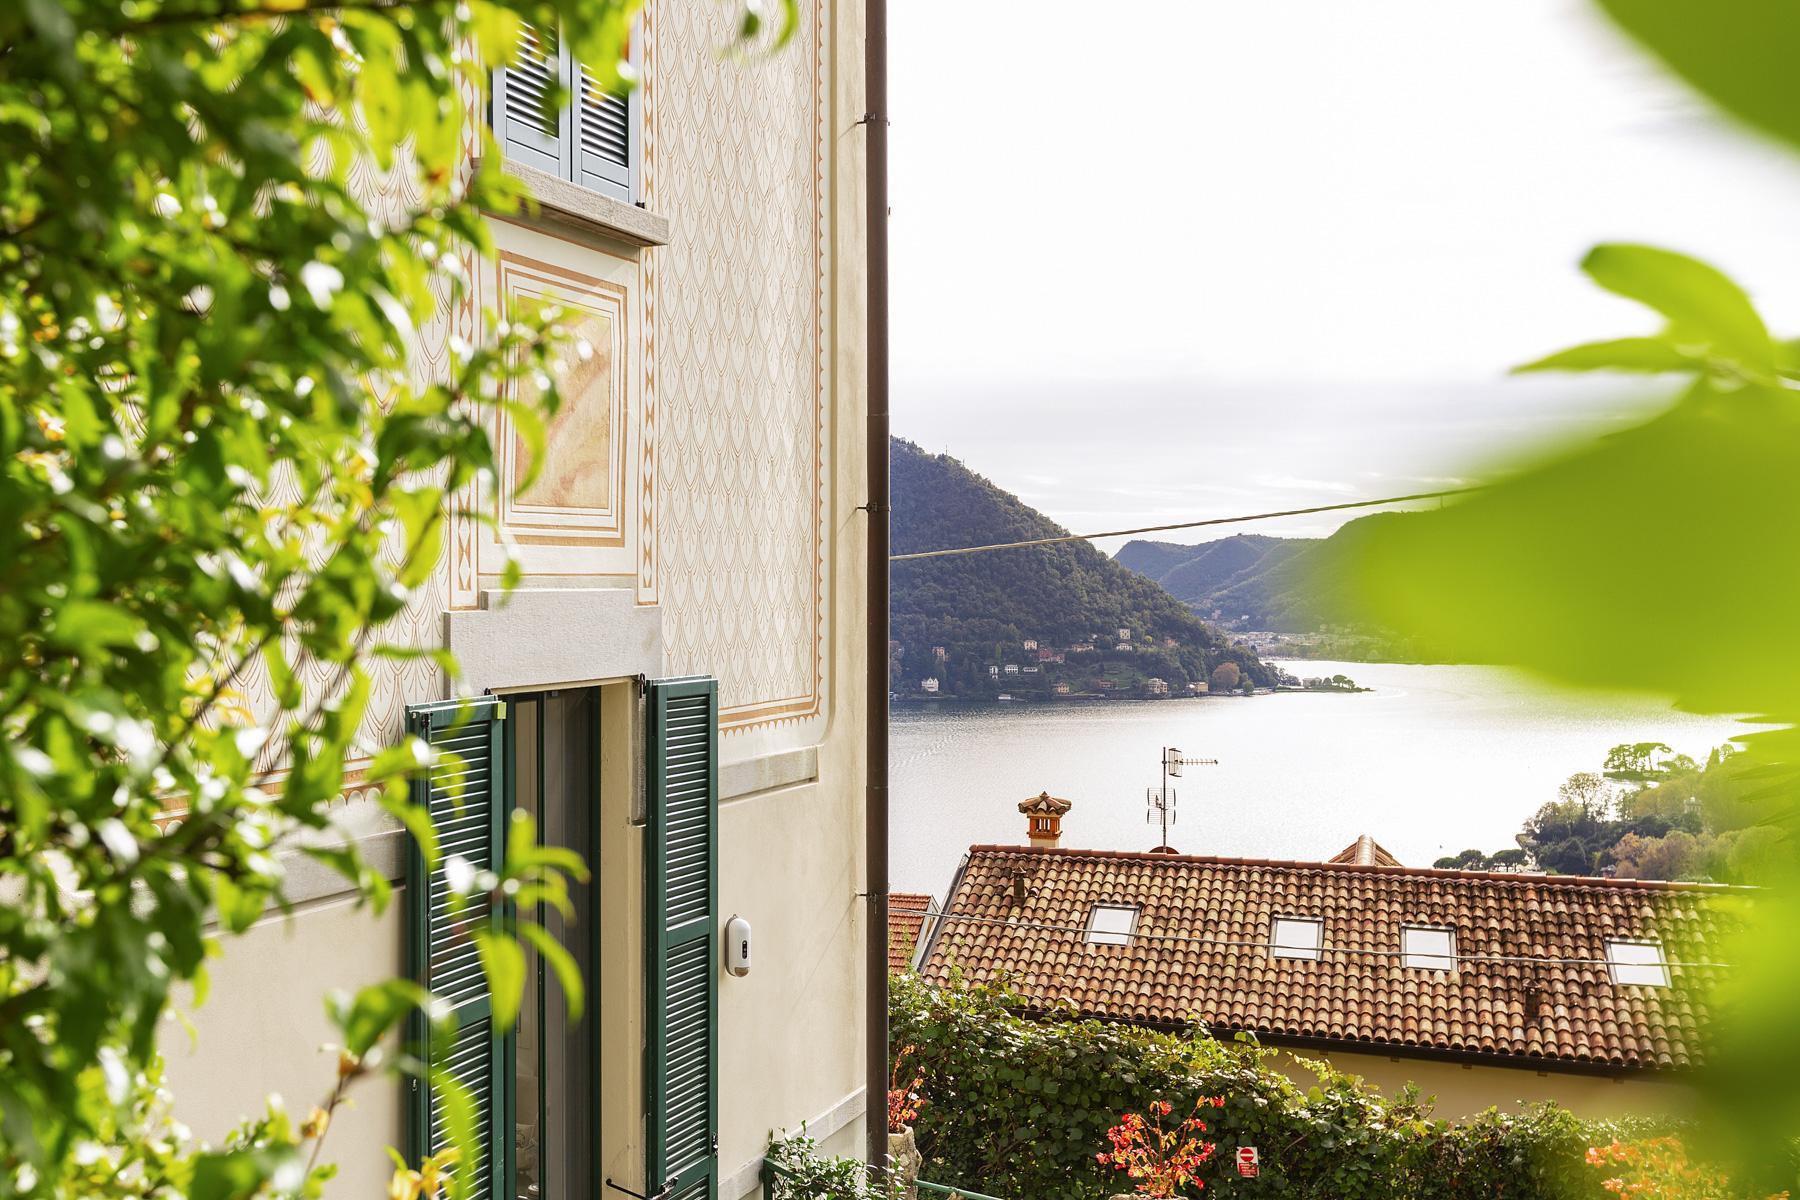 Como湖第一个船坞上可欣赏城市美景的美丽别墅。 - 2